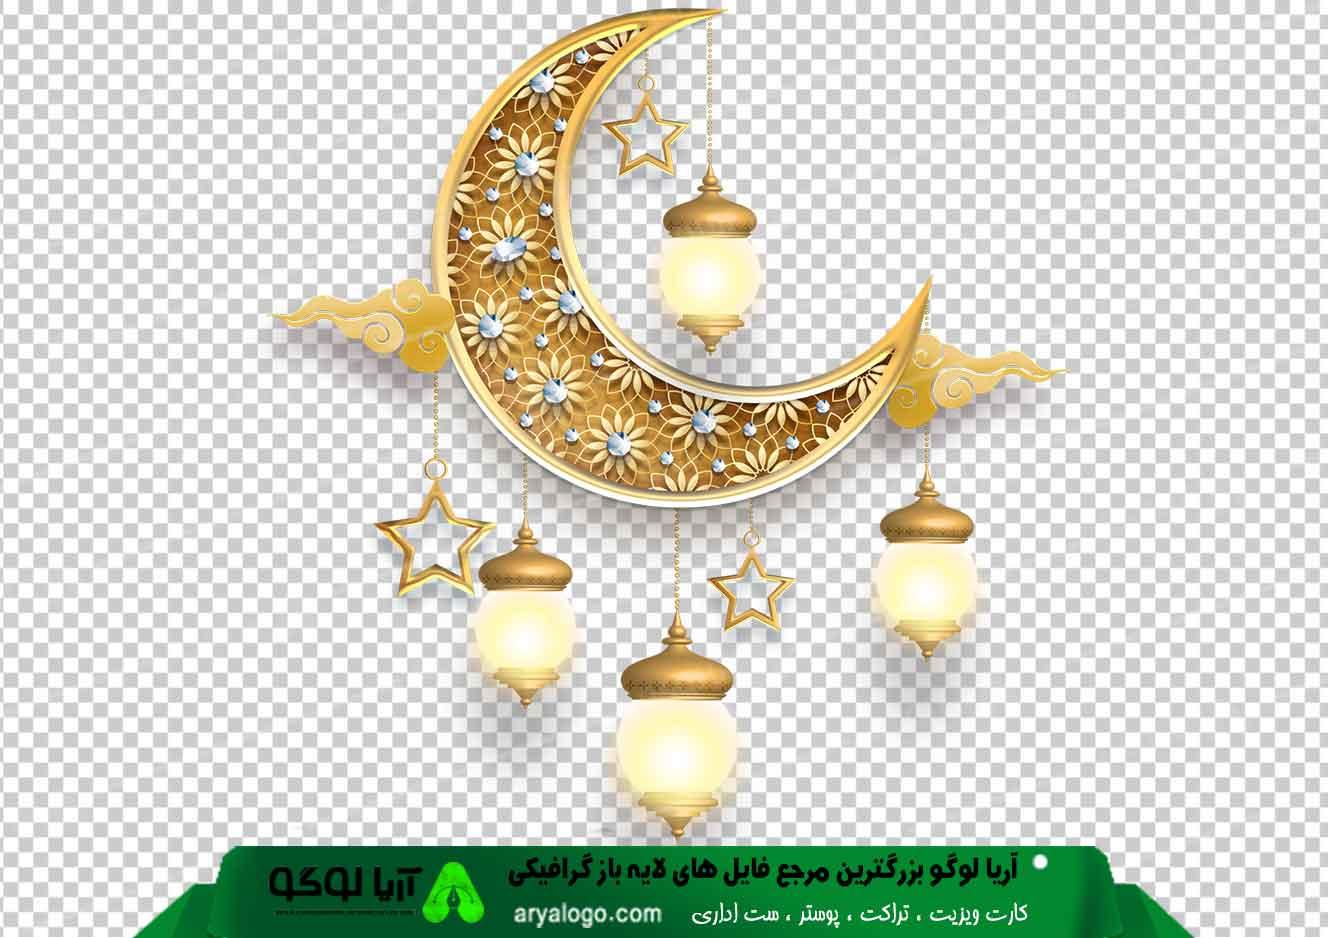 وکتور png ماه رمضان 21